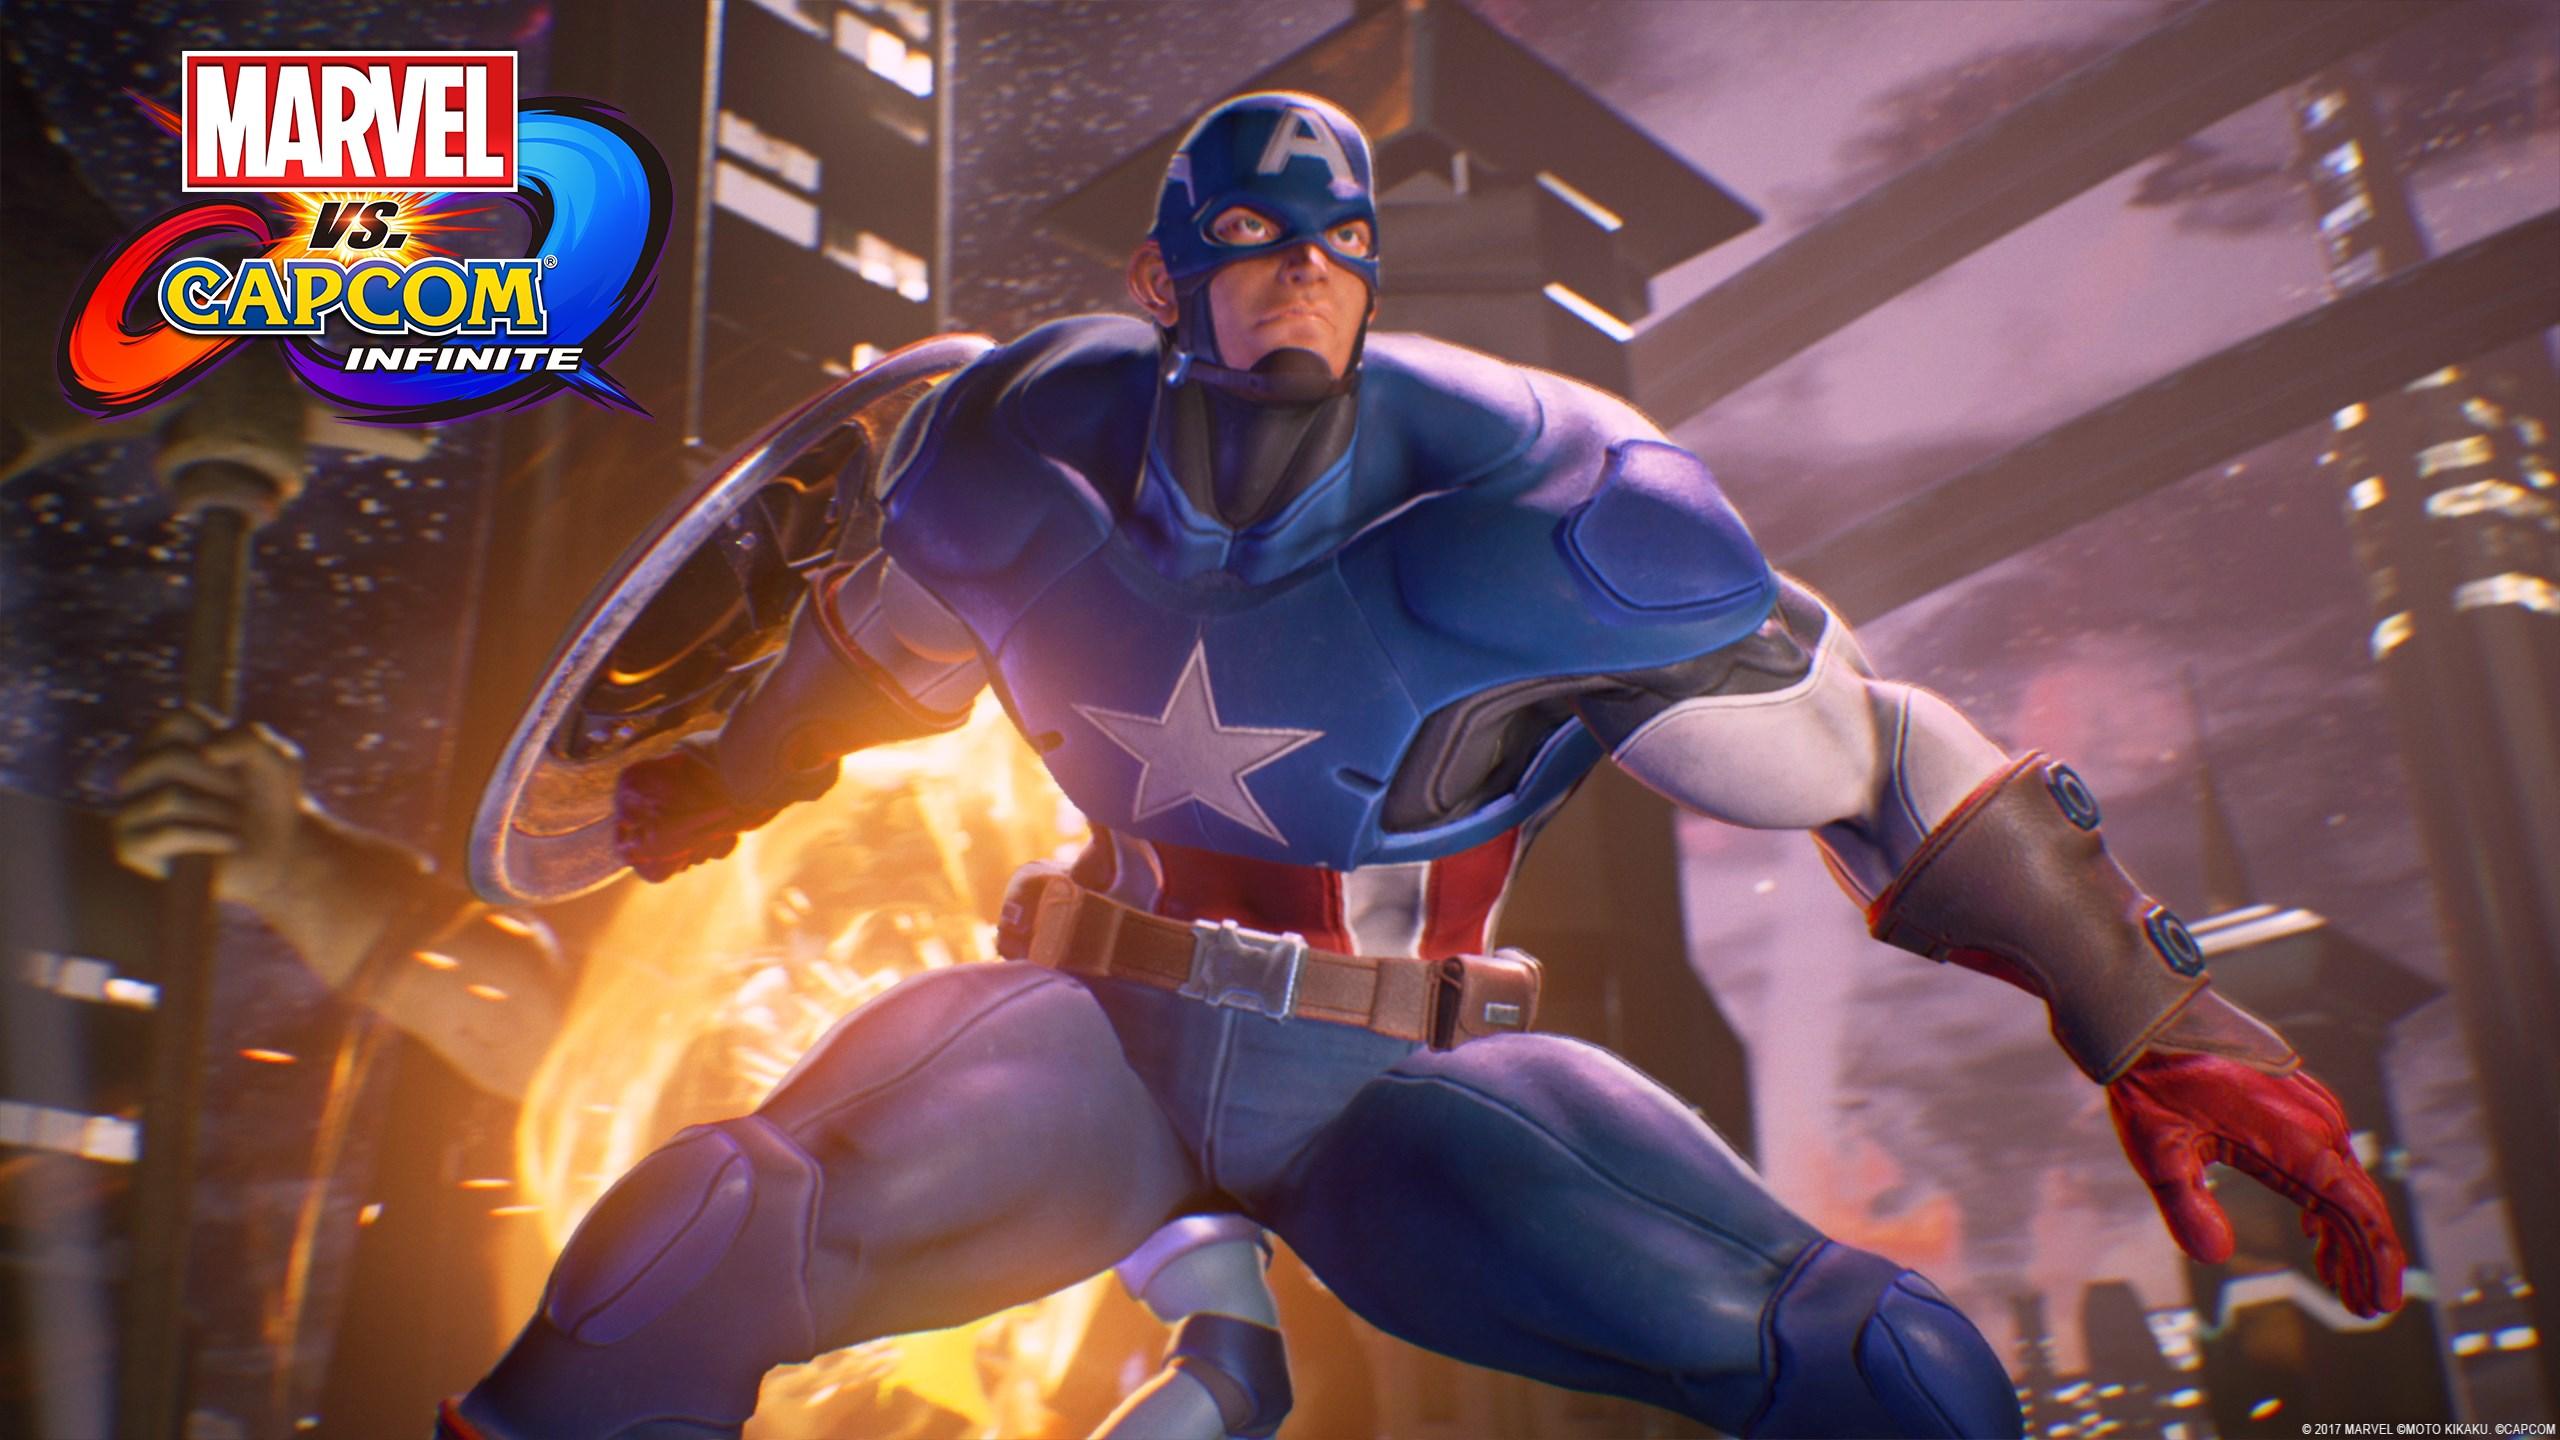 Marvel vs. Capcom: Infinite - Marvel vs. Capcom: Infinite 2K